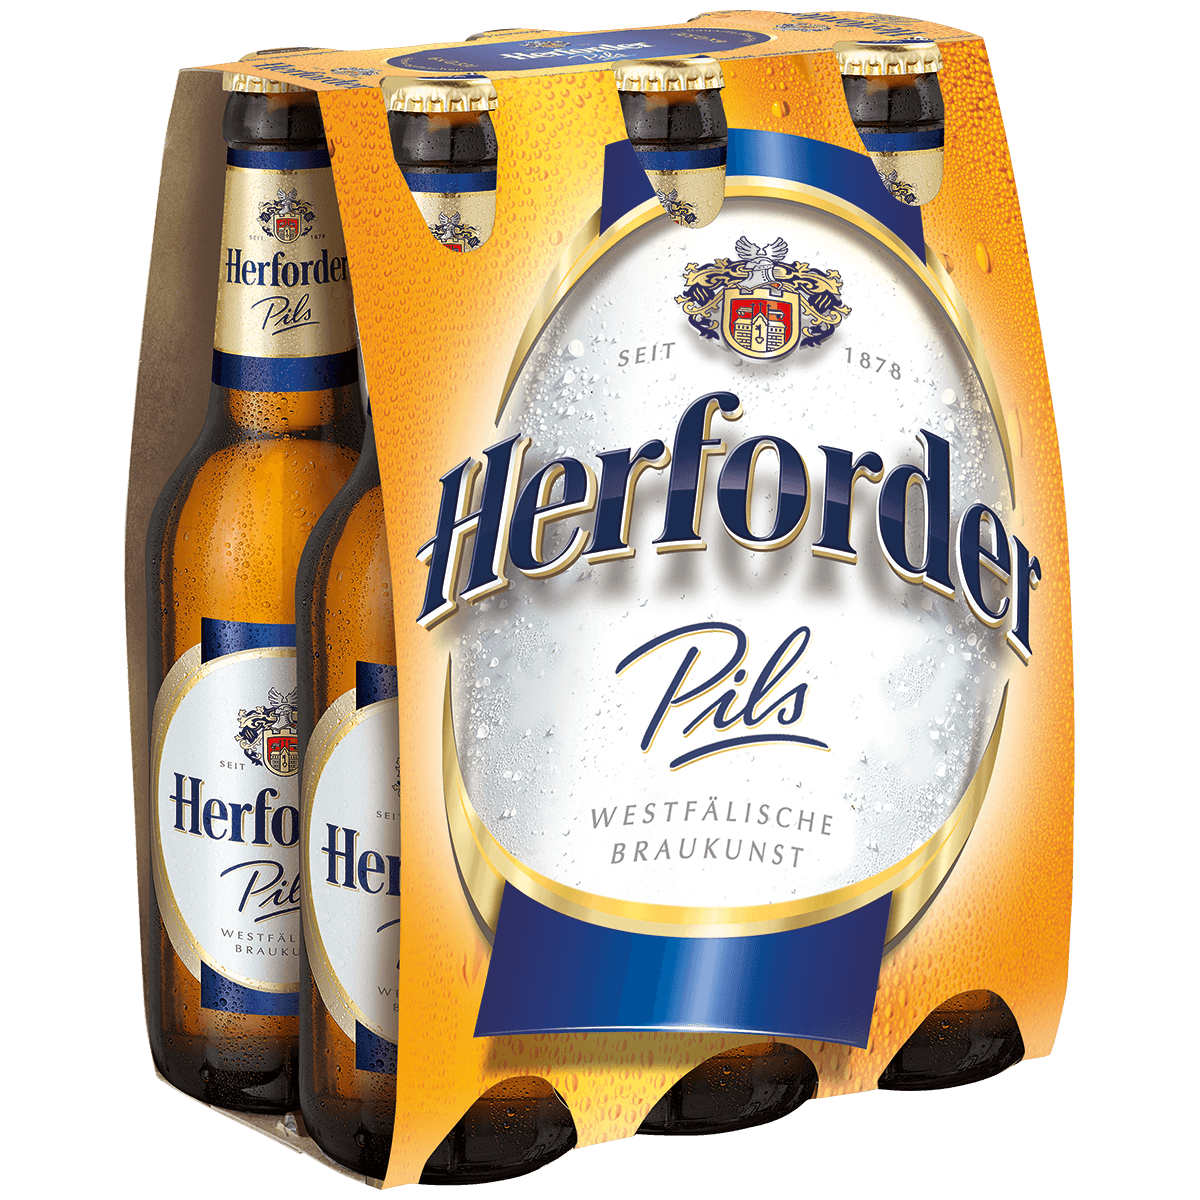 Herforder Pils 6 x 0,33L   Pils   Bier   Sortiment   Trinkgut